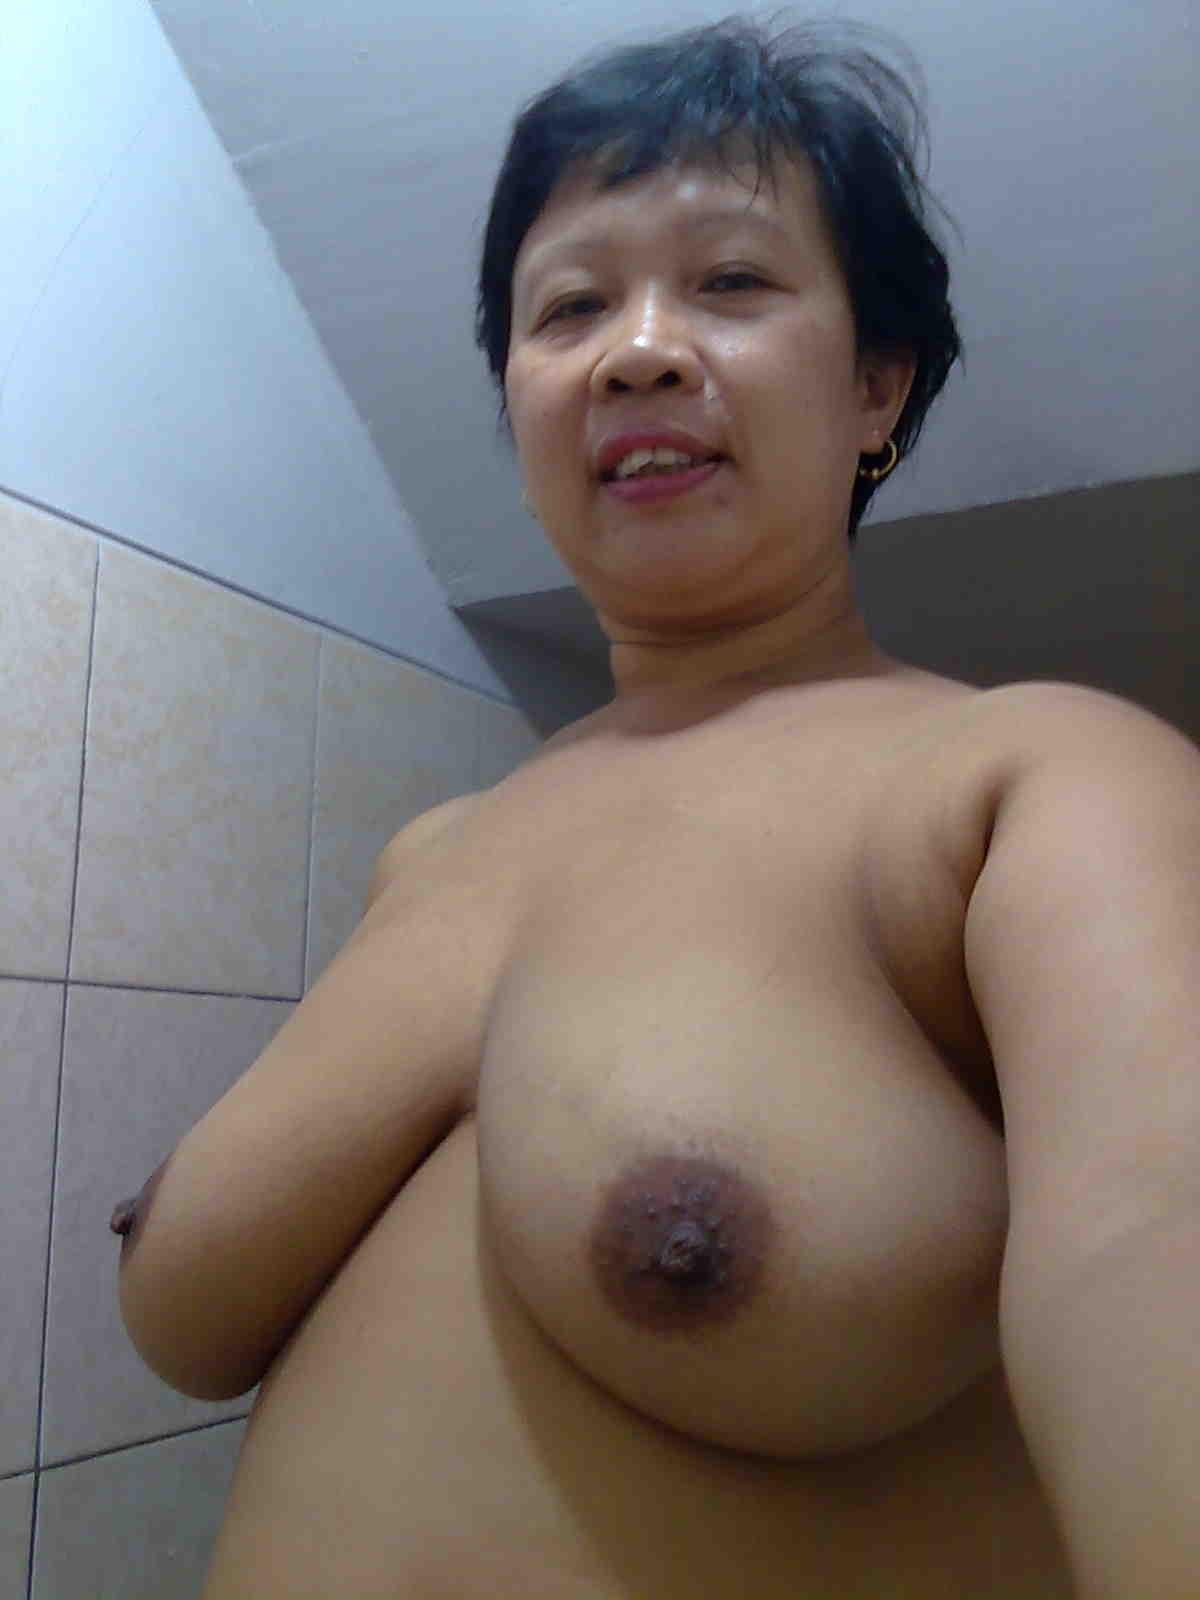 Nude porn hot pic ethiopian hot girl xxx